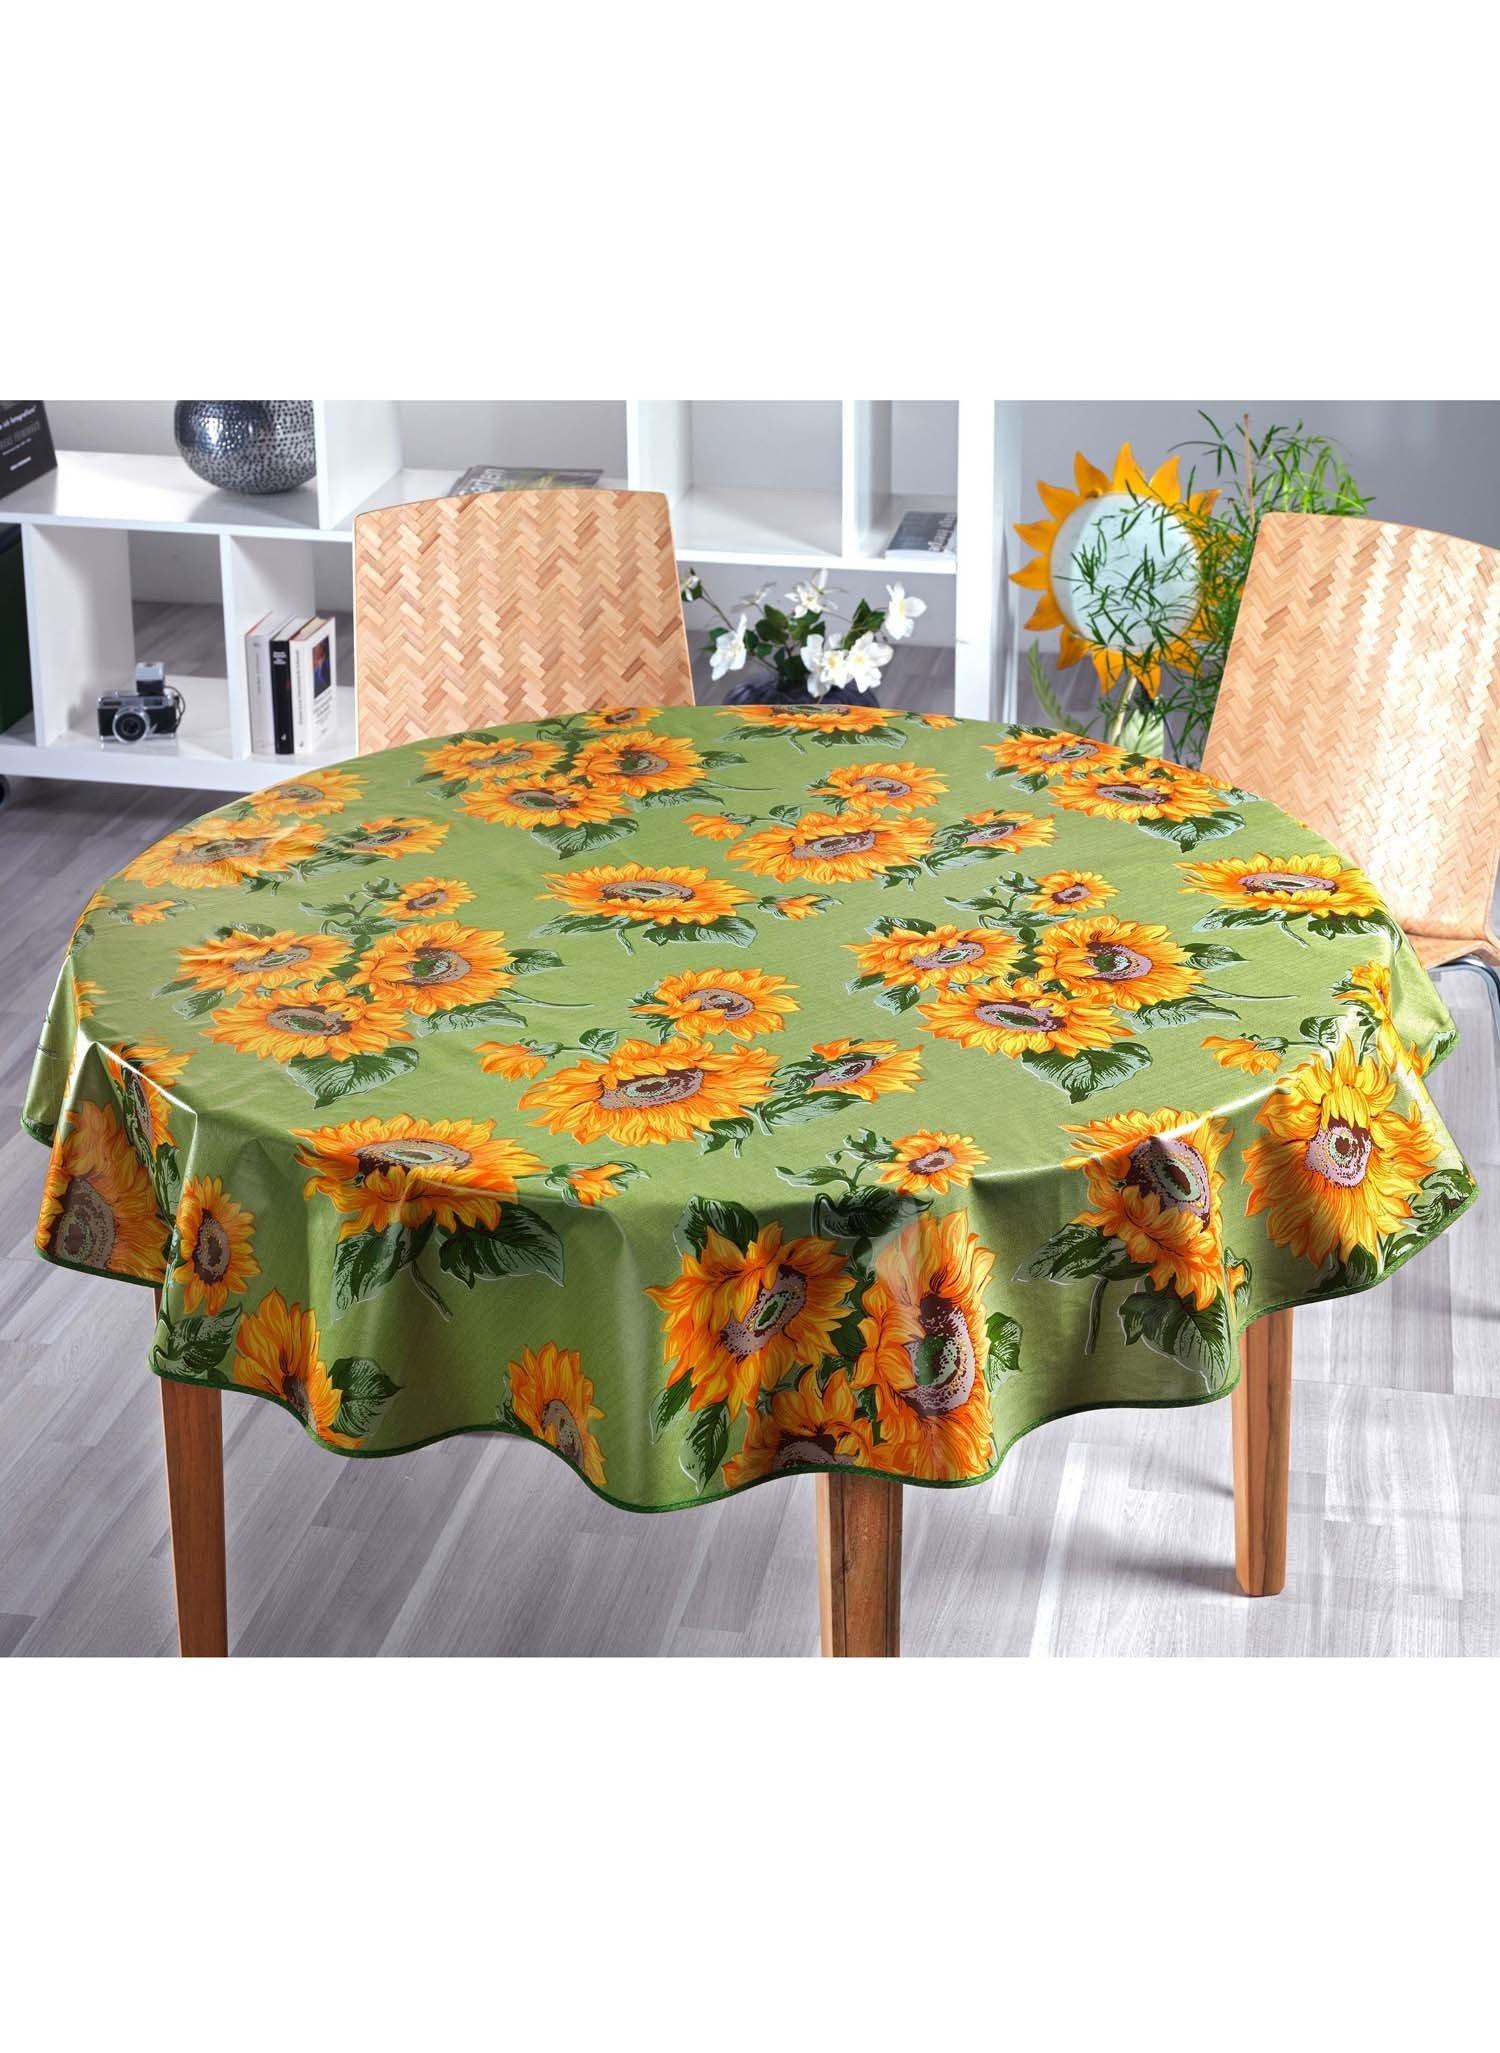 Tisch.Sonnenblume.grün 160cm - 1 - Ronja.ch